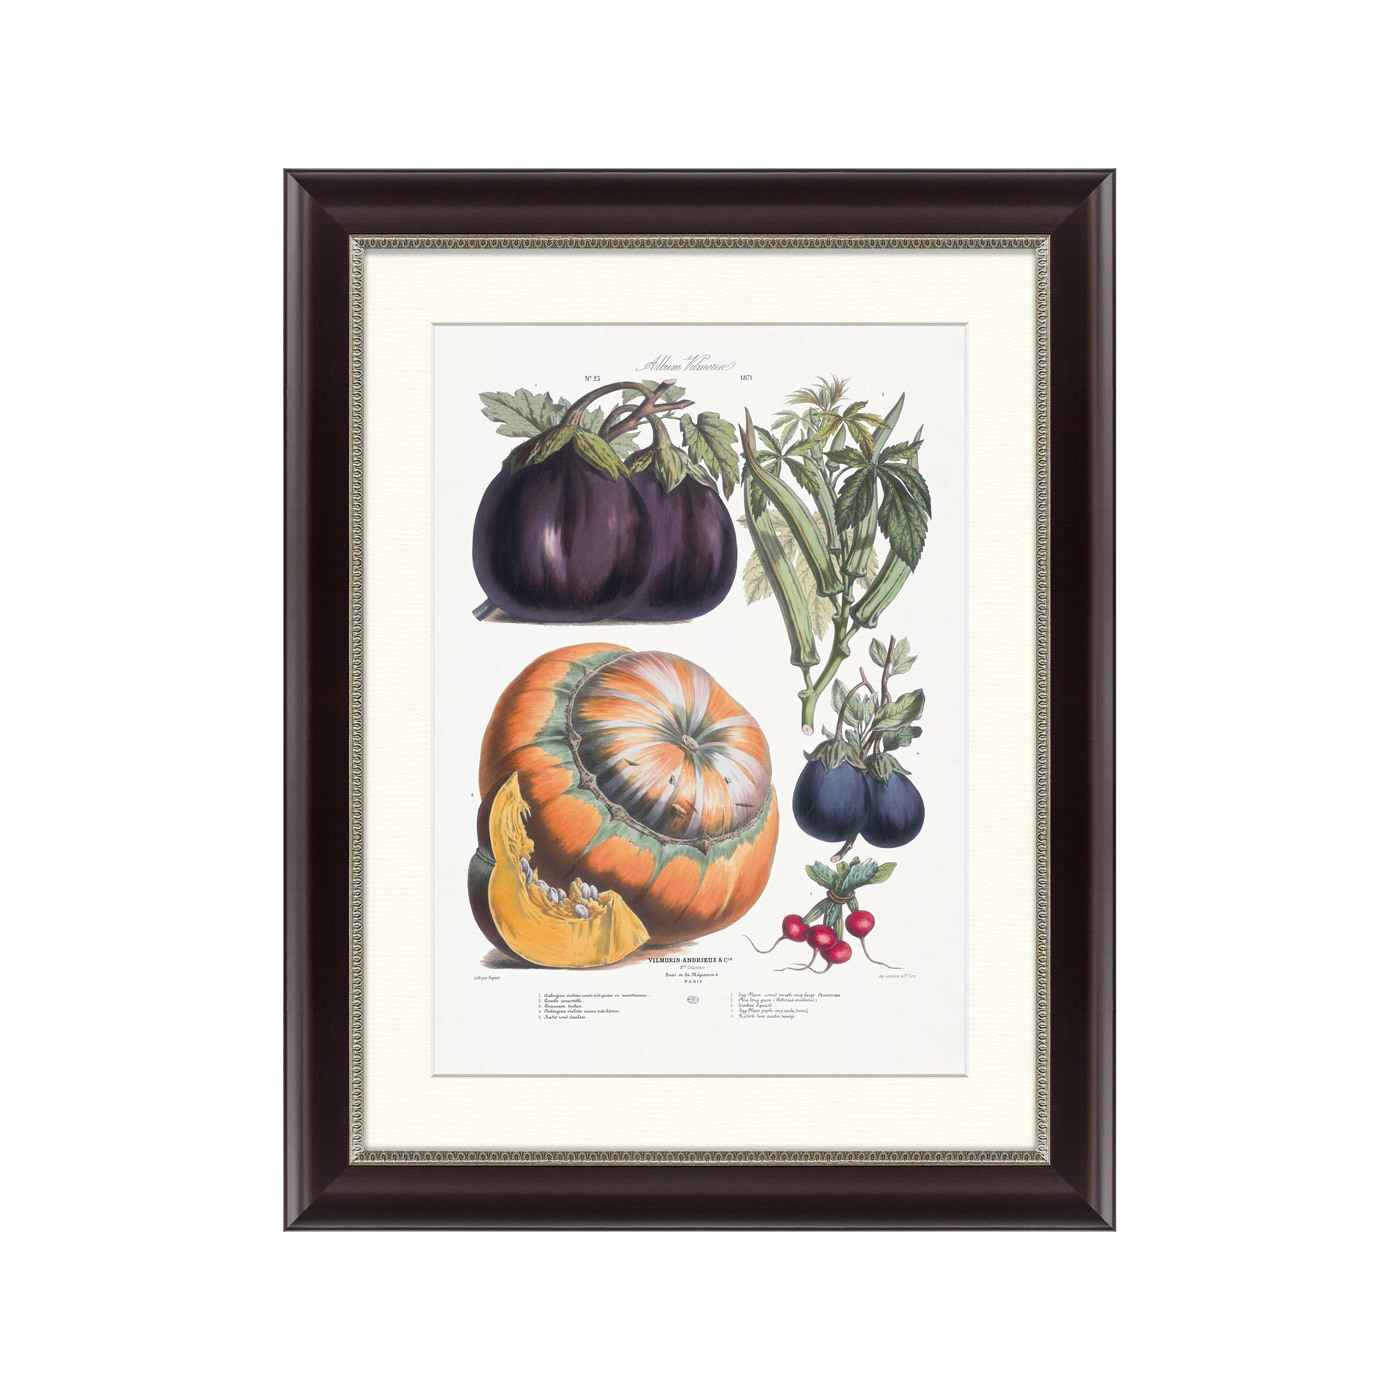 {} Картины в Квартиру Картина Vilmorin Andrieux & Cie, Альбом №23 (47х60 см) картины в квартиру картина etude 2 102х130 см